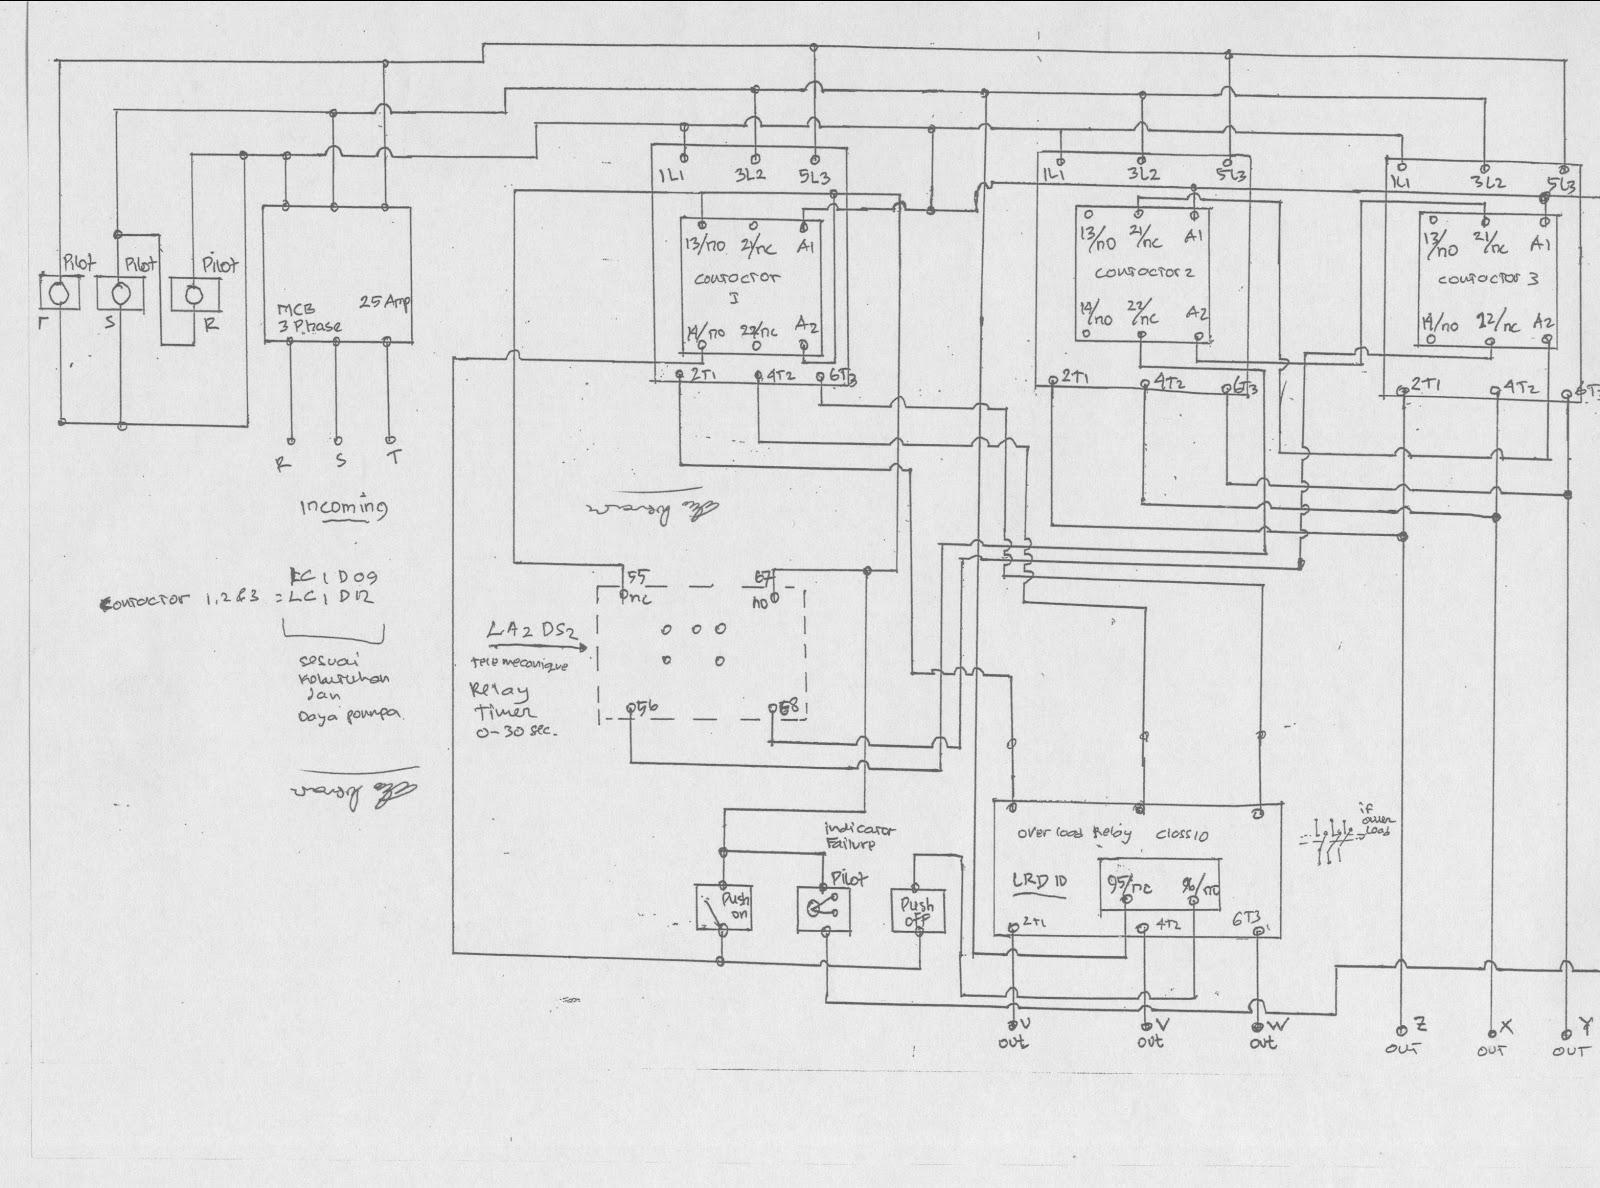 3 Phase Panel Box